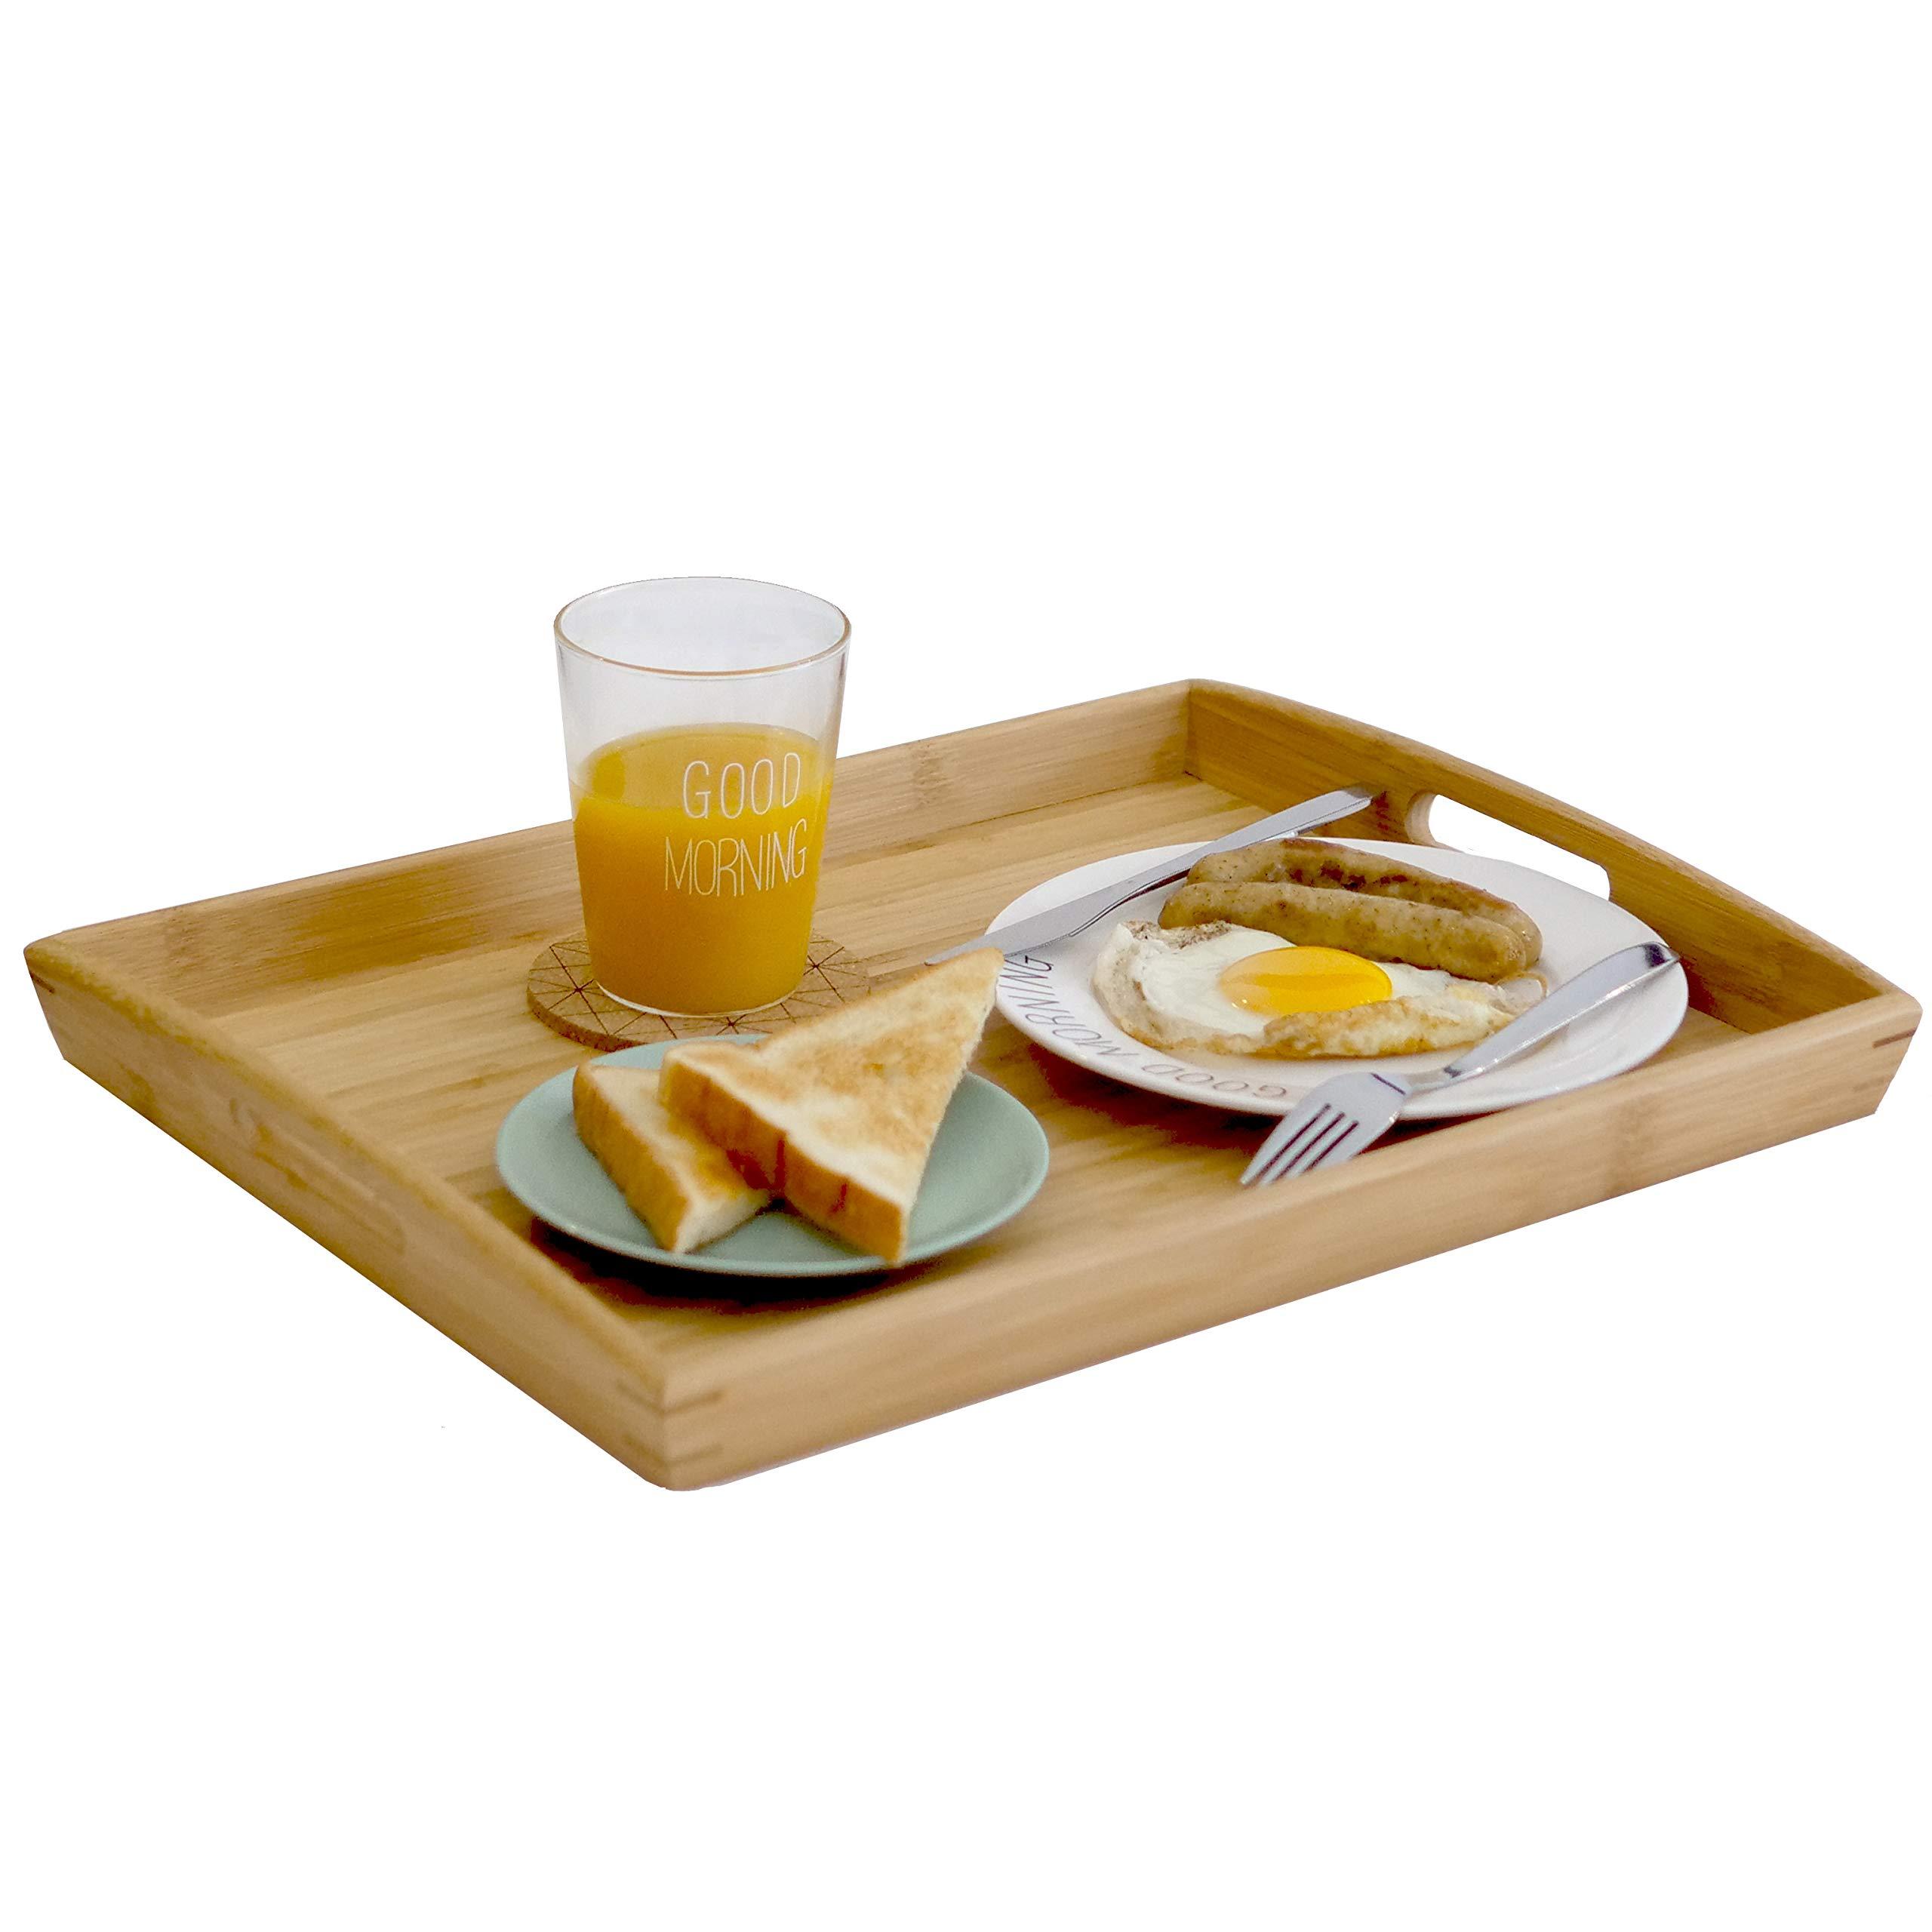 Joy&Grace 100%BambooWoodButlerServingTraywithHandles - Breakfast/Coffee TableTray, DecorativeOttomanTray, ServingPlatterforParty,17''×13''